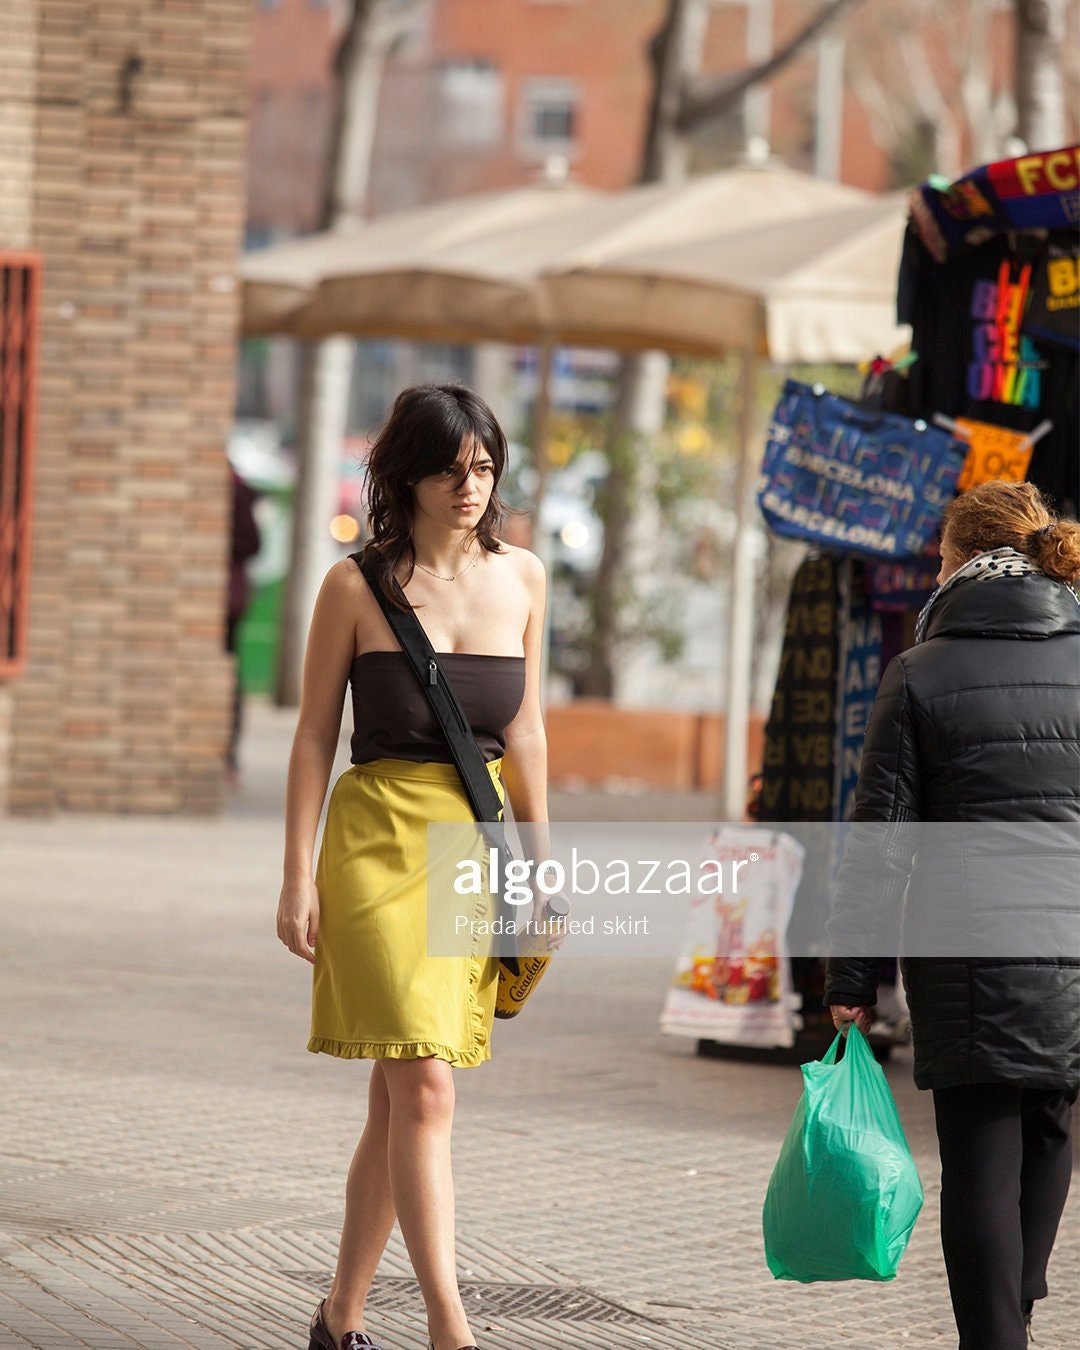 047af6e57f684 Prada ruffled skirt